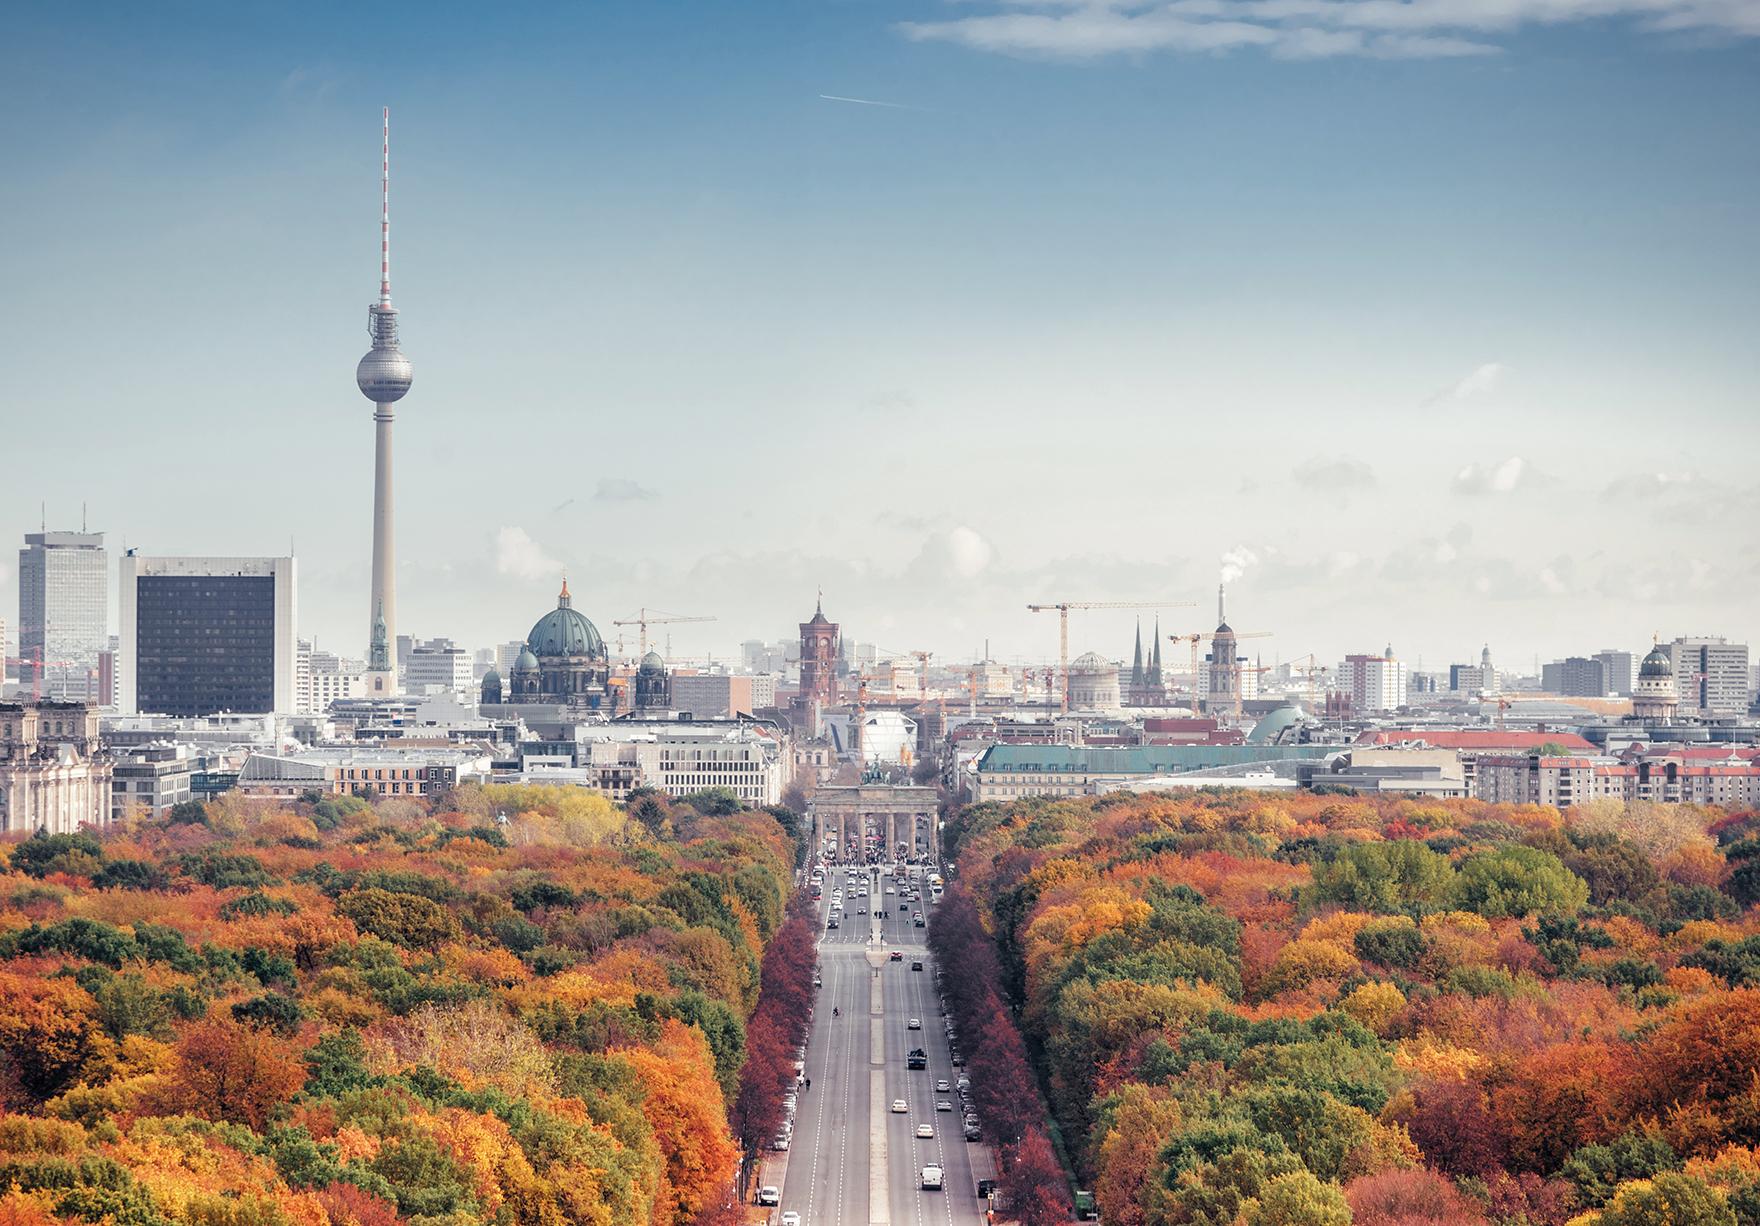 Berlin Study Trip Cityscape Skyline Lh